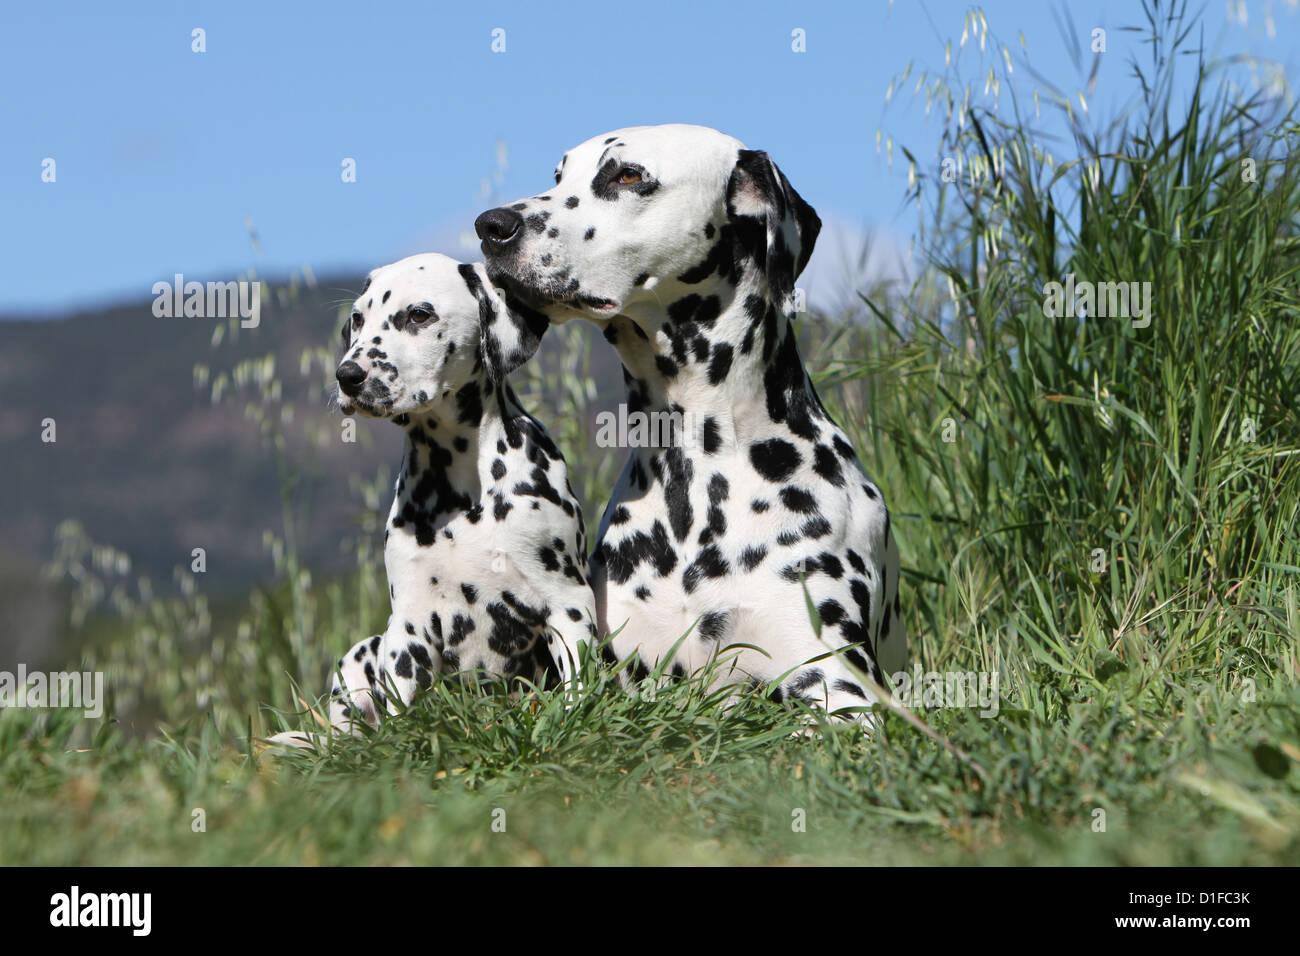 Dog Dalmatian / Dalmatiner / Dalmatien adult and puppy - Stock Image